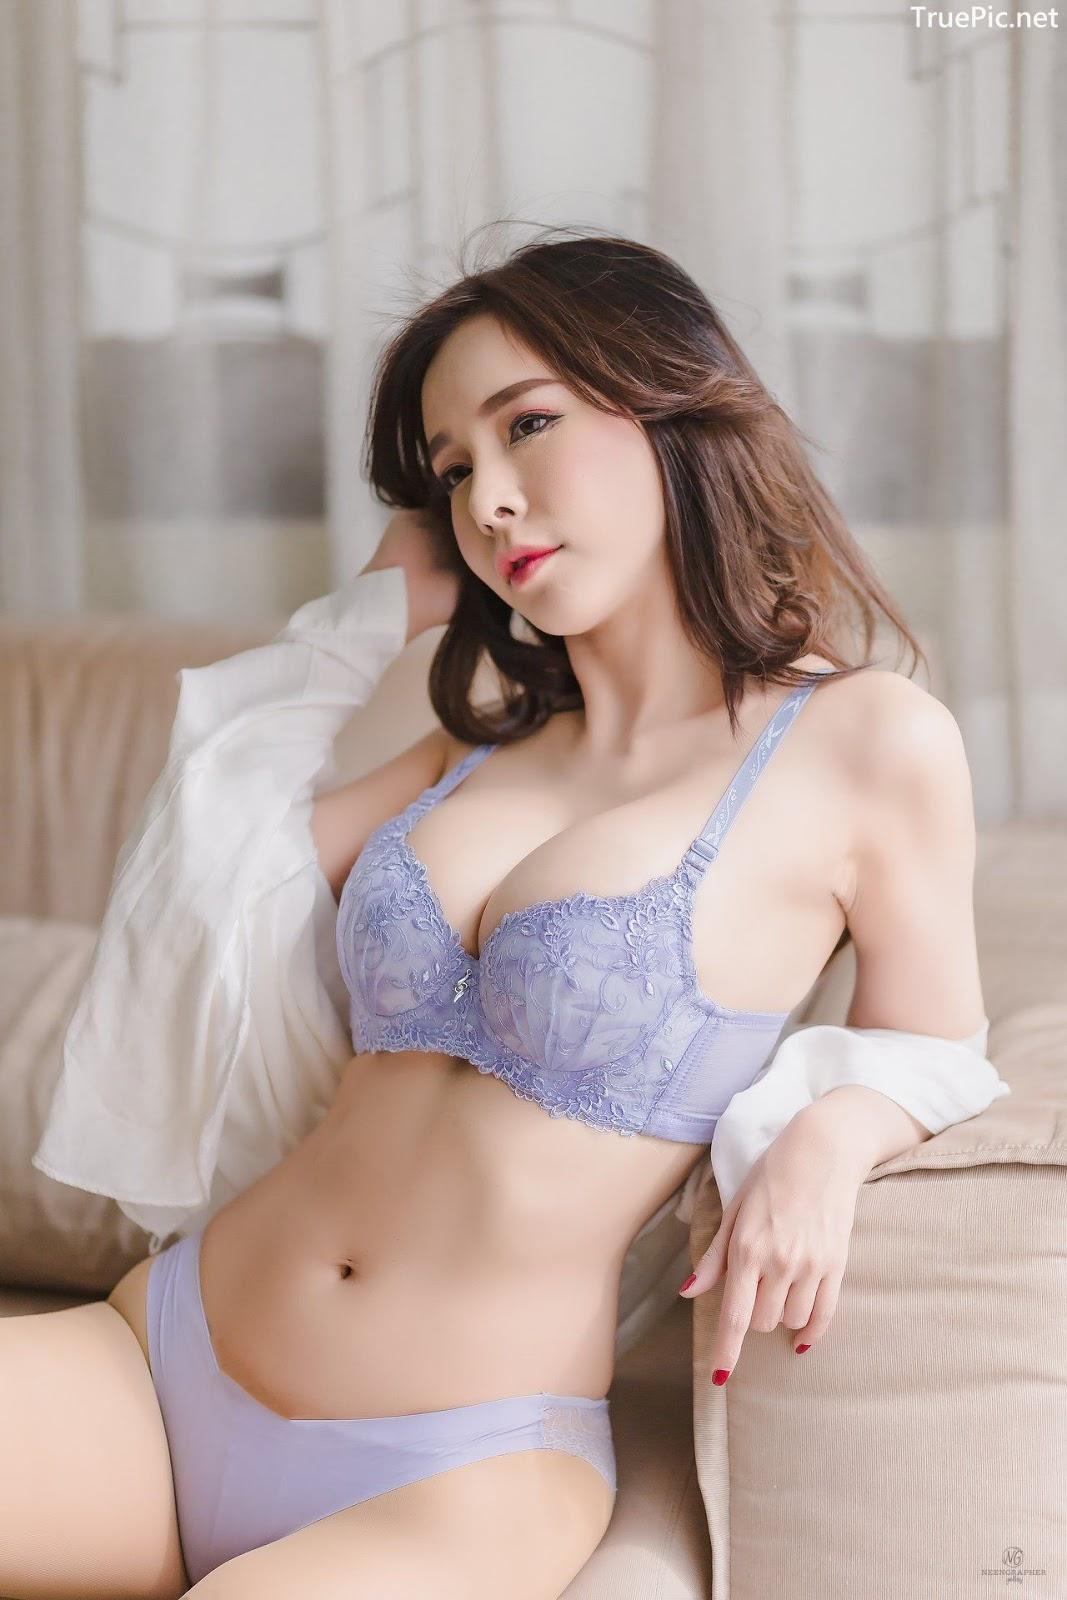 Image-Thailand-Hot-Model-Skykikijung-Purple-Lingerie-TruePic.net- Picture-1